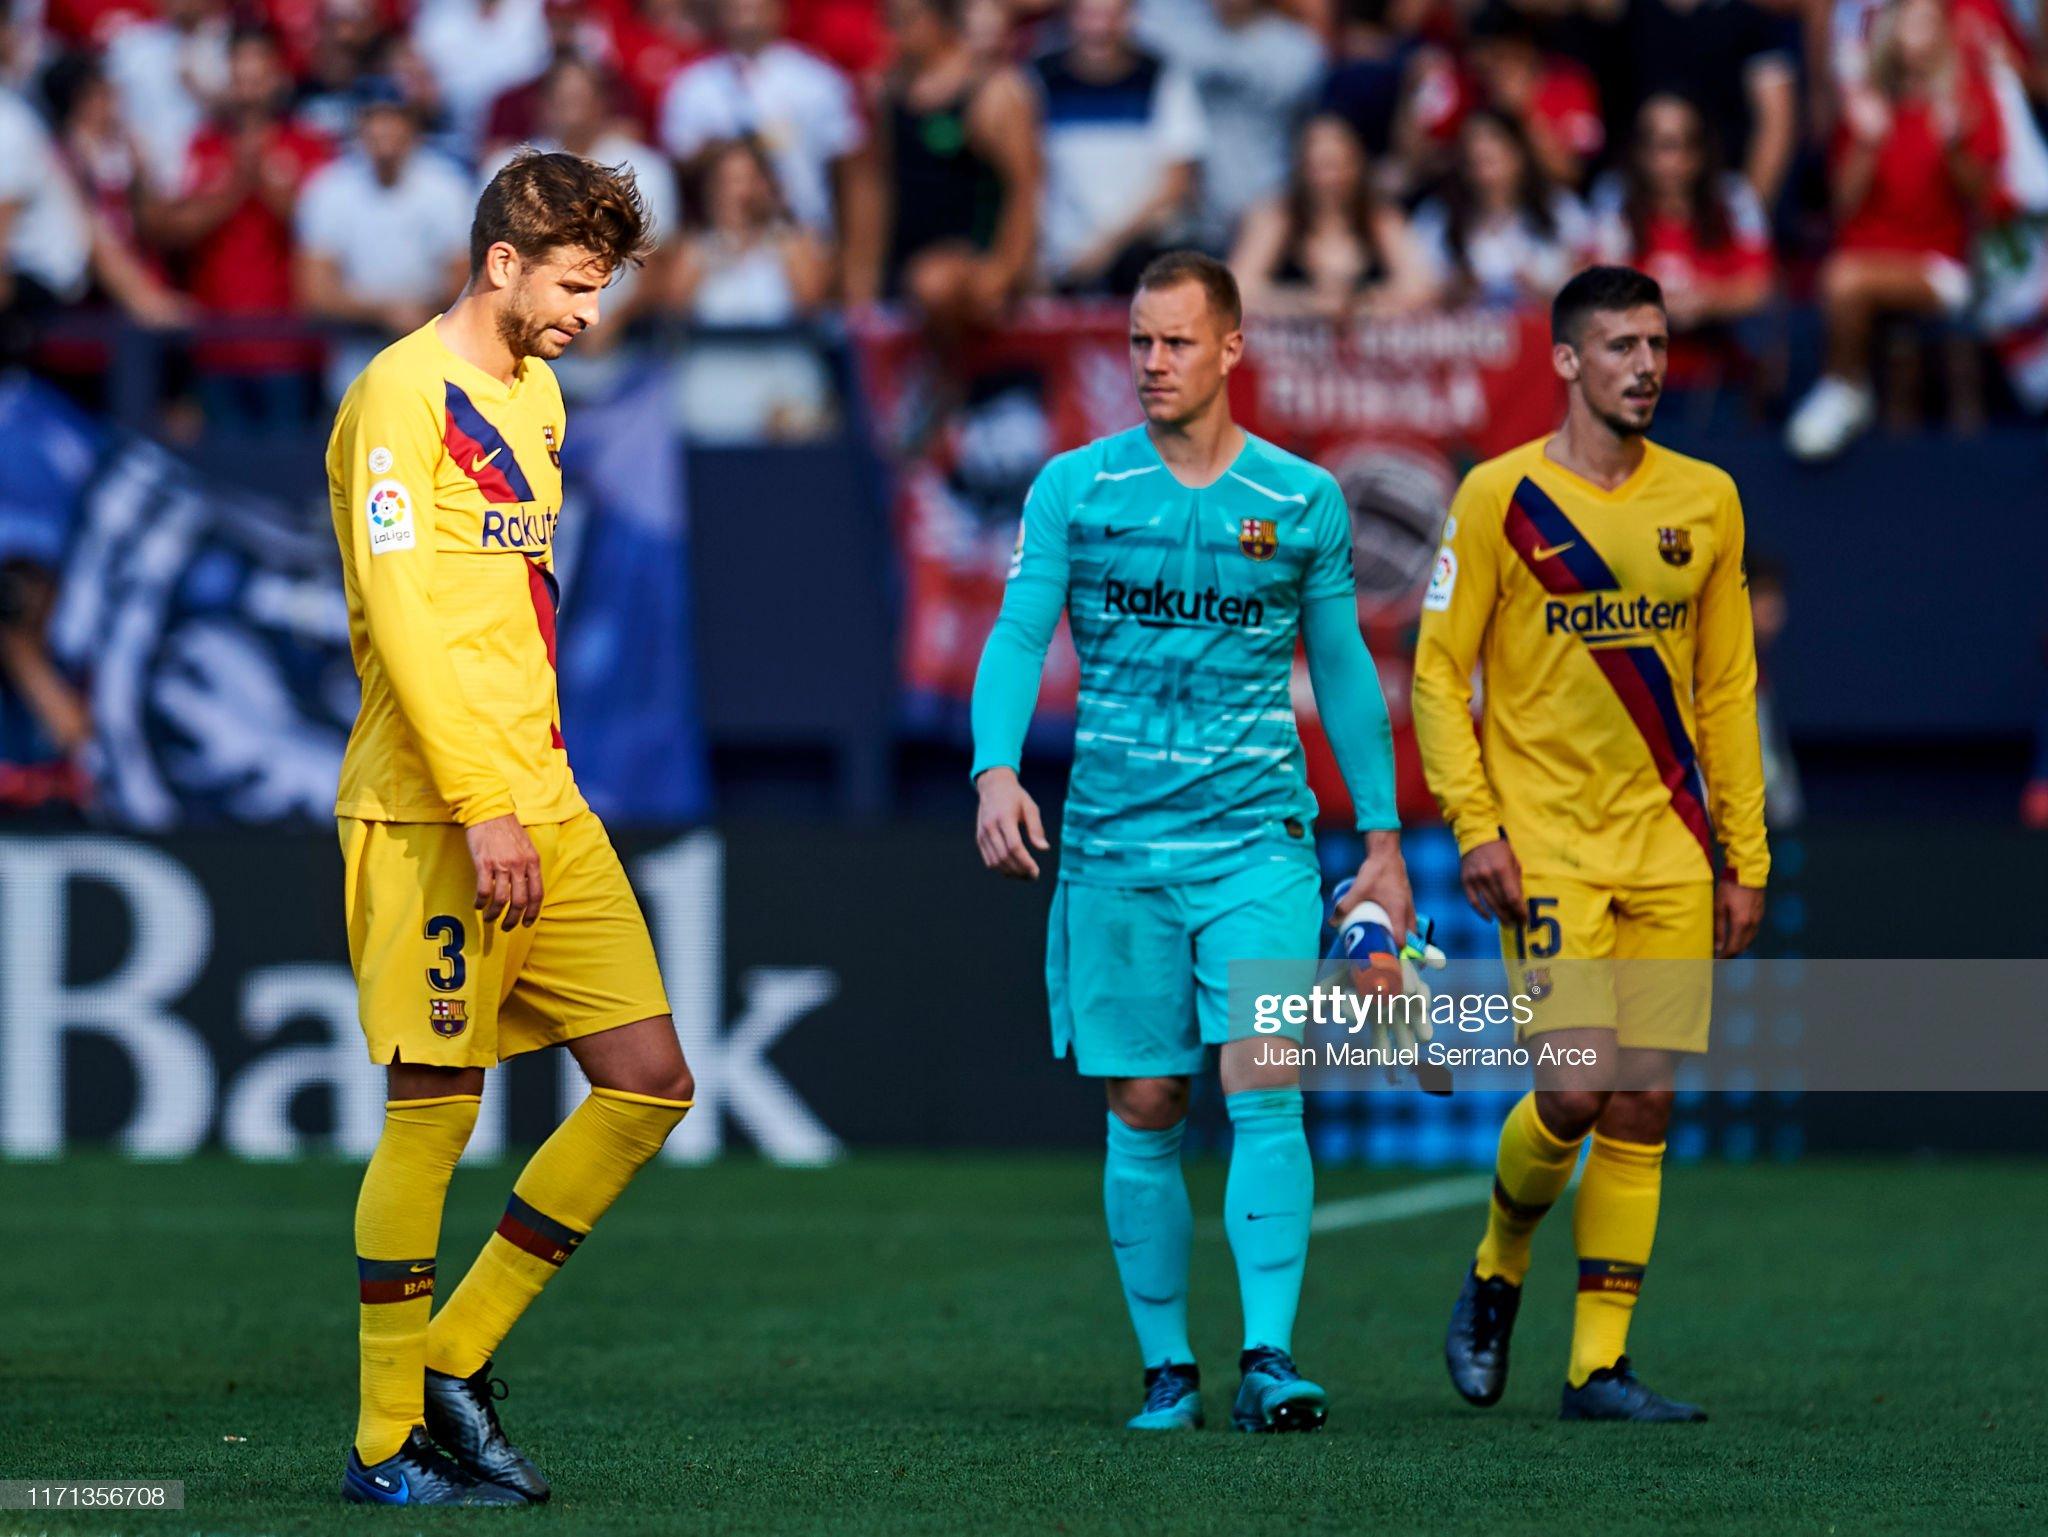 صور مباراة : أوساسونا - برشلونة 2-2 ( 31-08-2019 )  Gerard-pique-of-fc-barcelona-reacts-during-the-liga-match-between-ca-picture-id1171356708?s=2048x2048